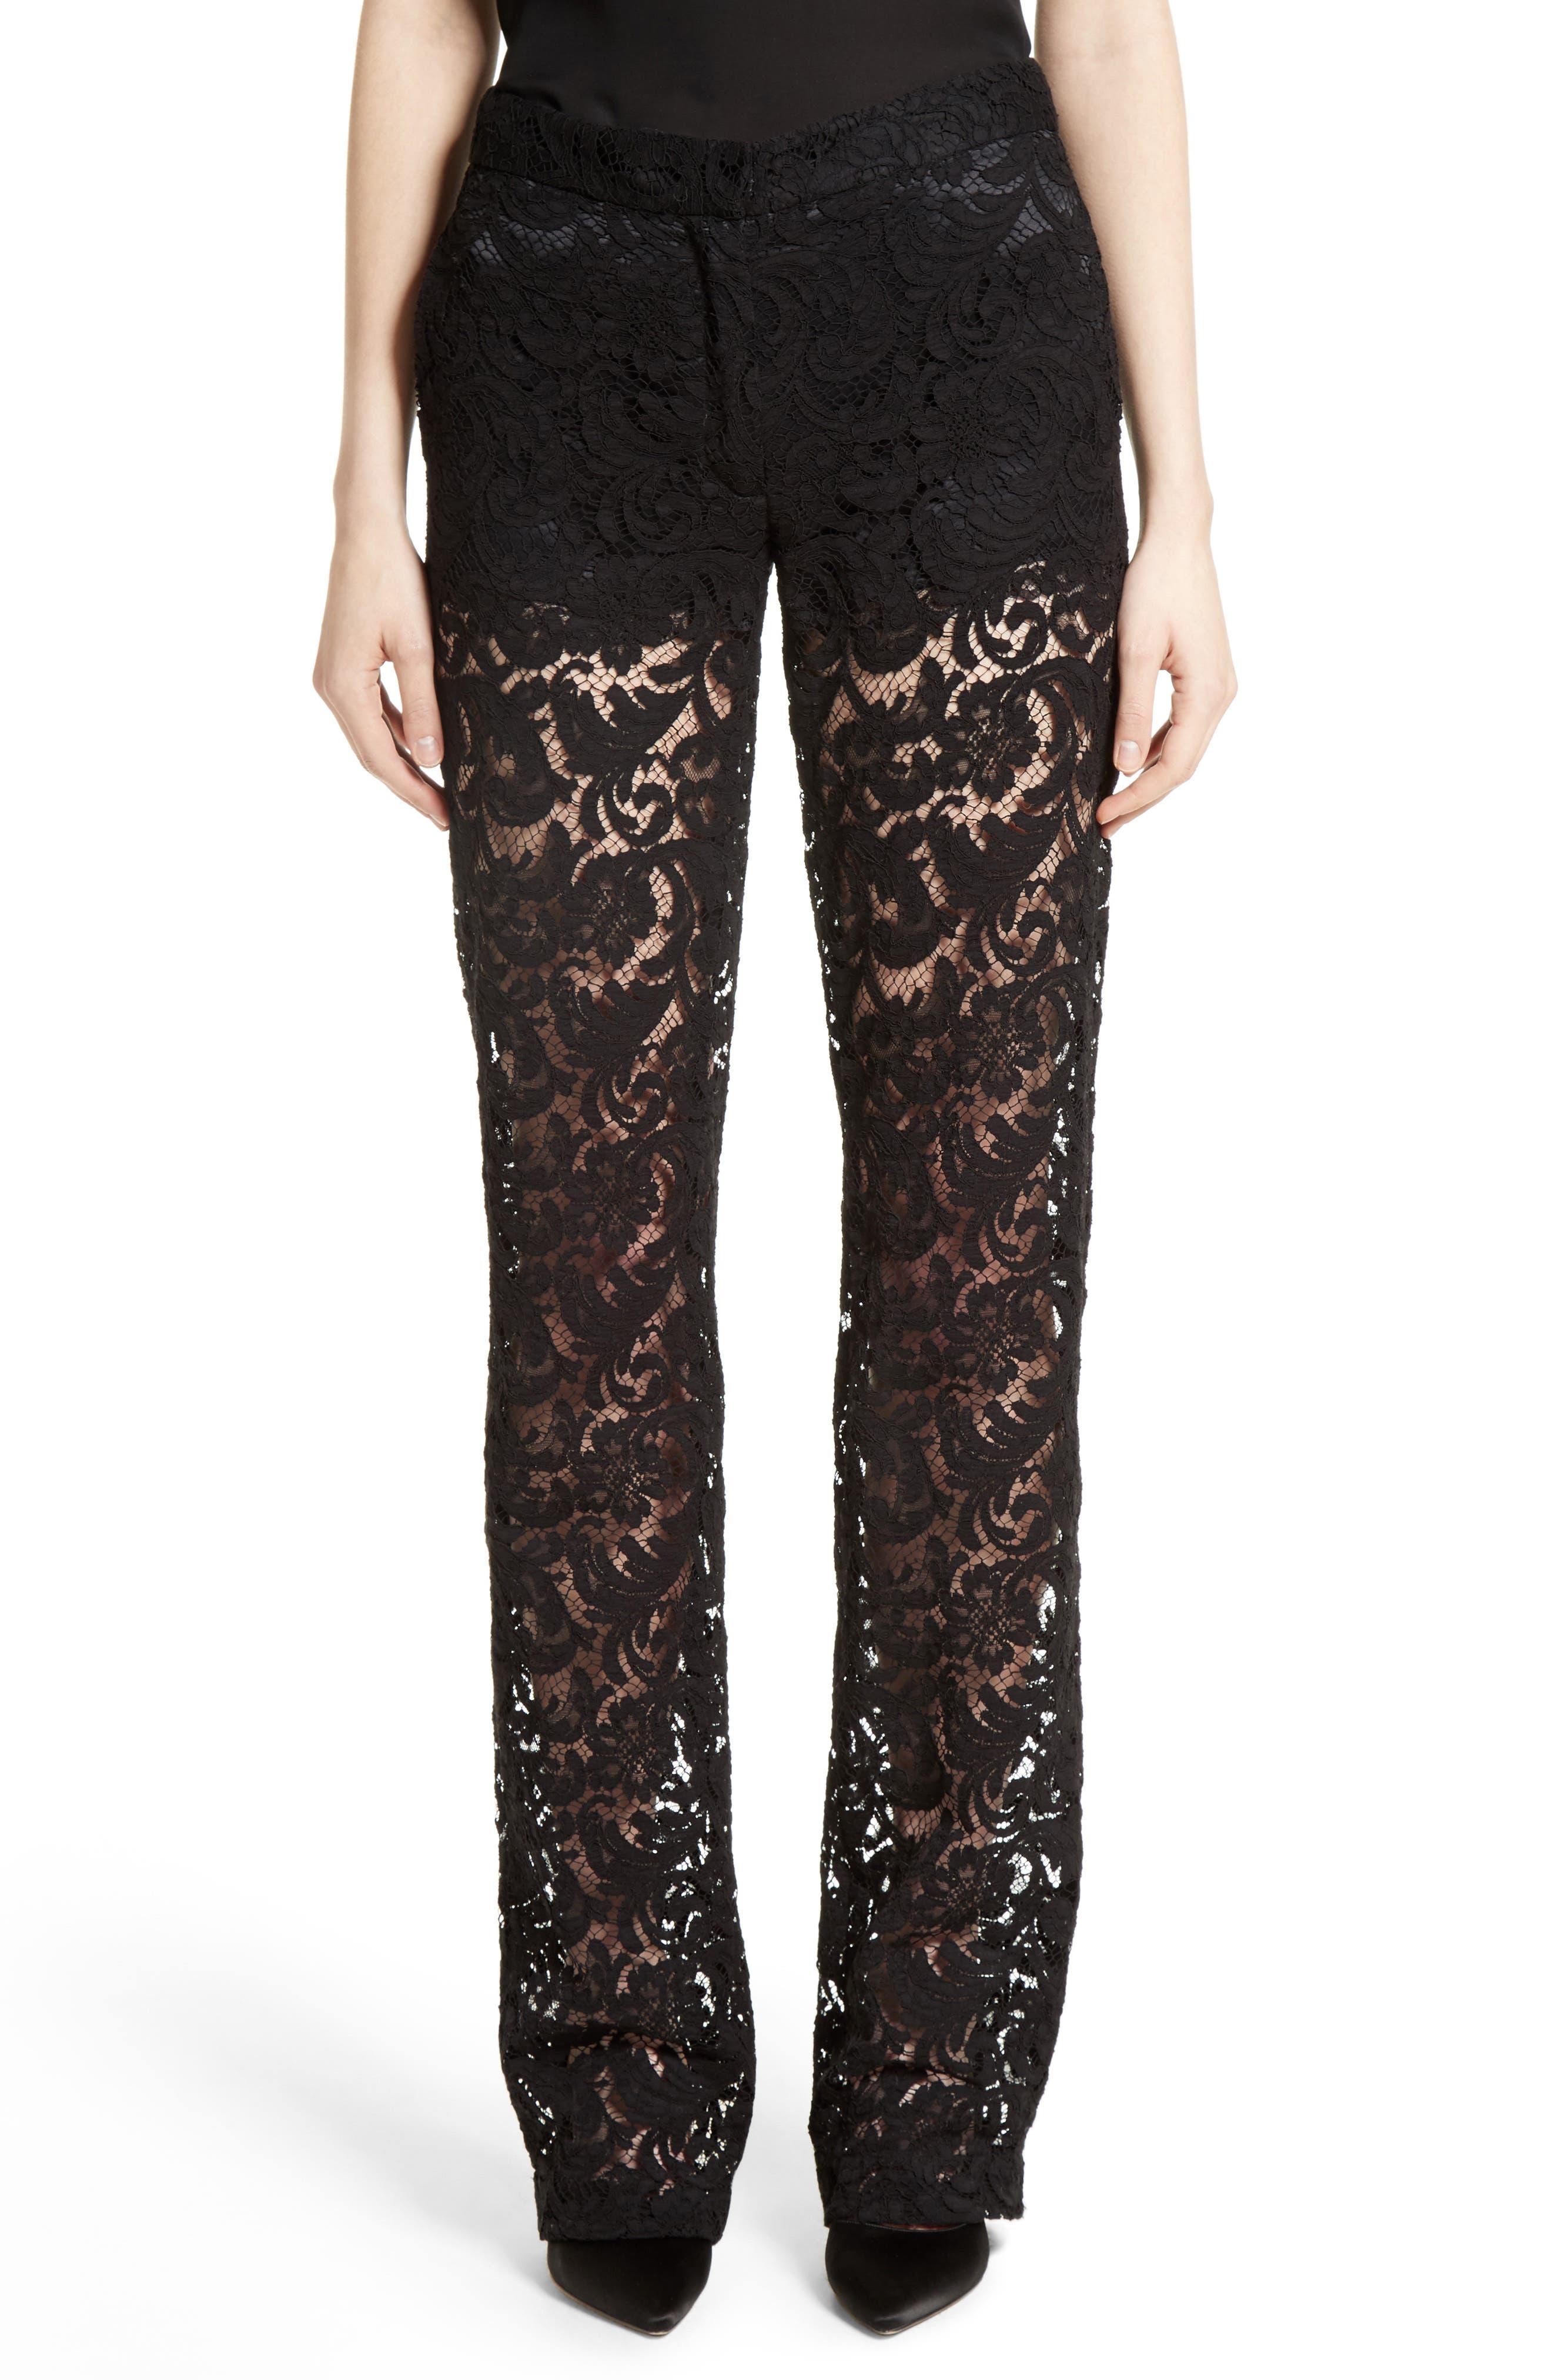 Alternate Image 1 Selected - Adam Lippes Lace Tuxedo Pants